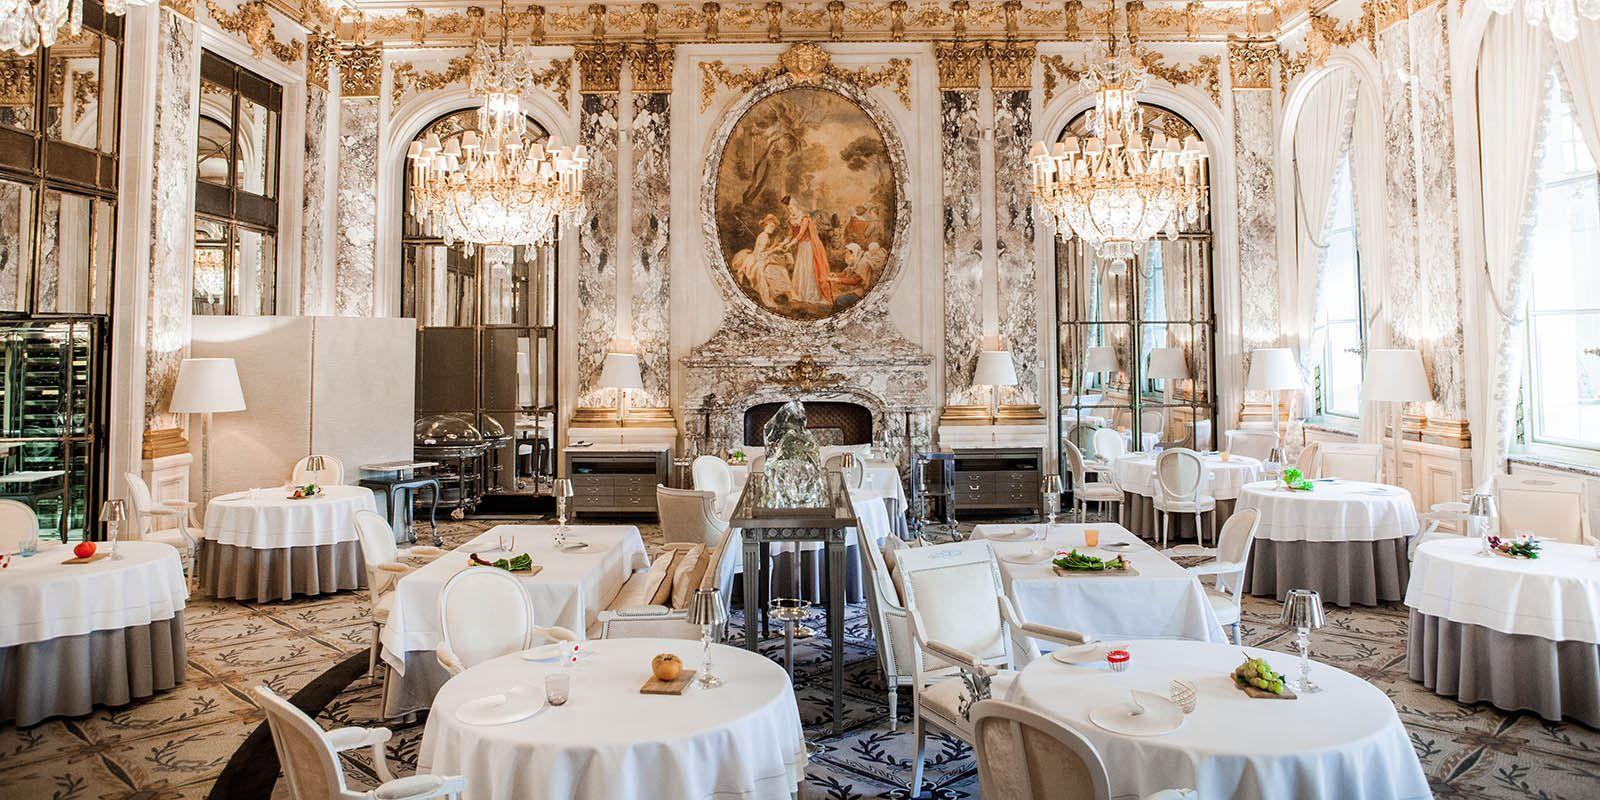 Le Meurice Alain Ducasse Luxury Restaurant